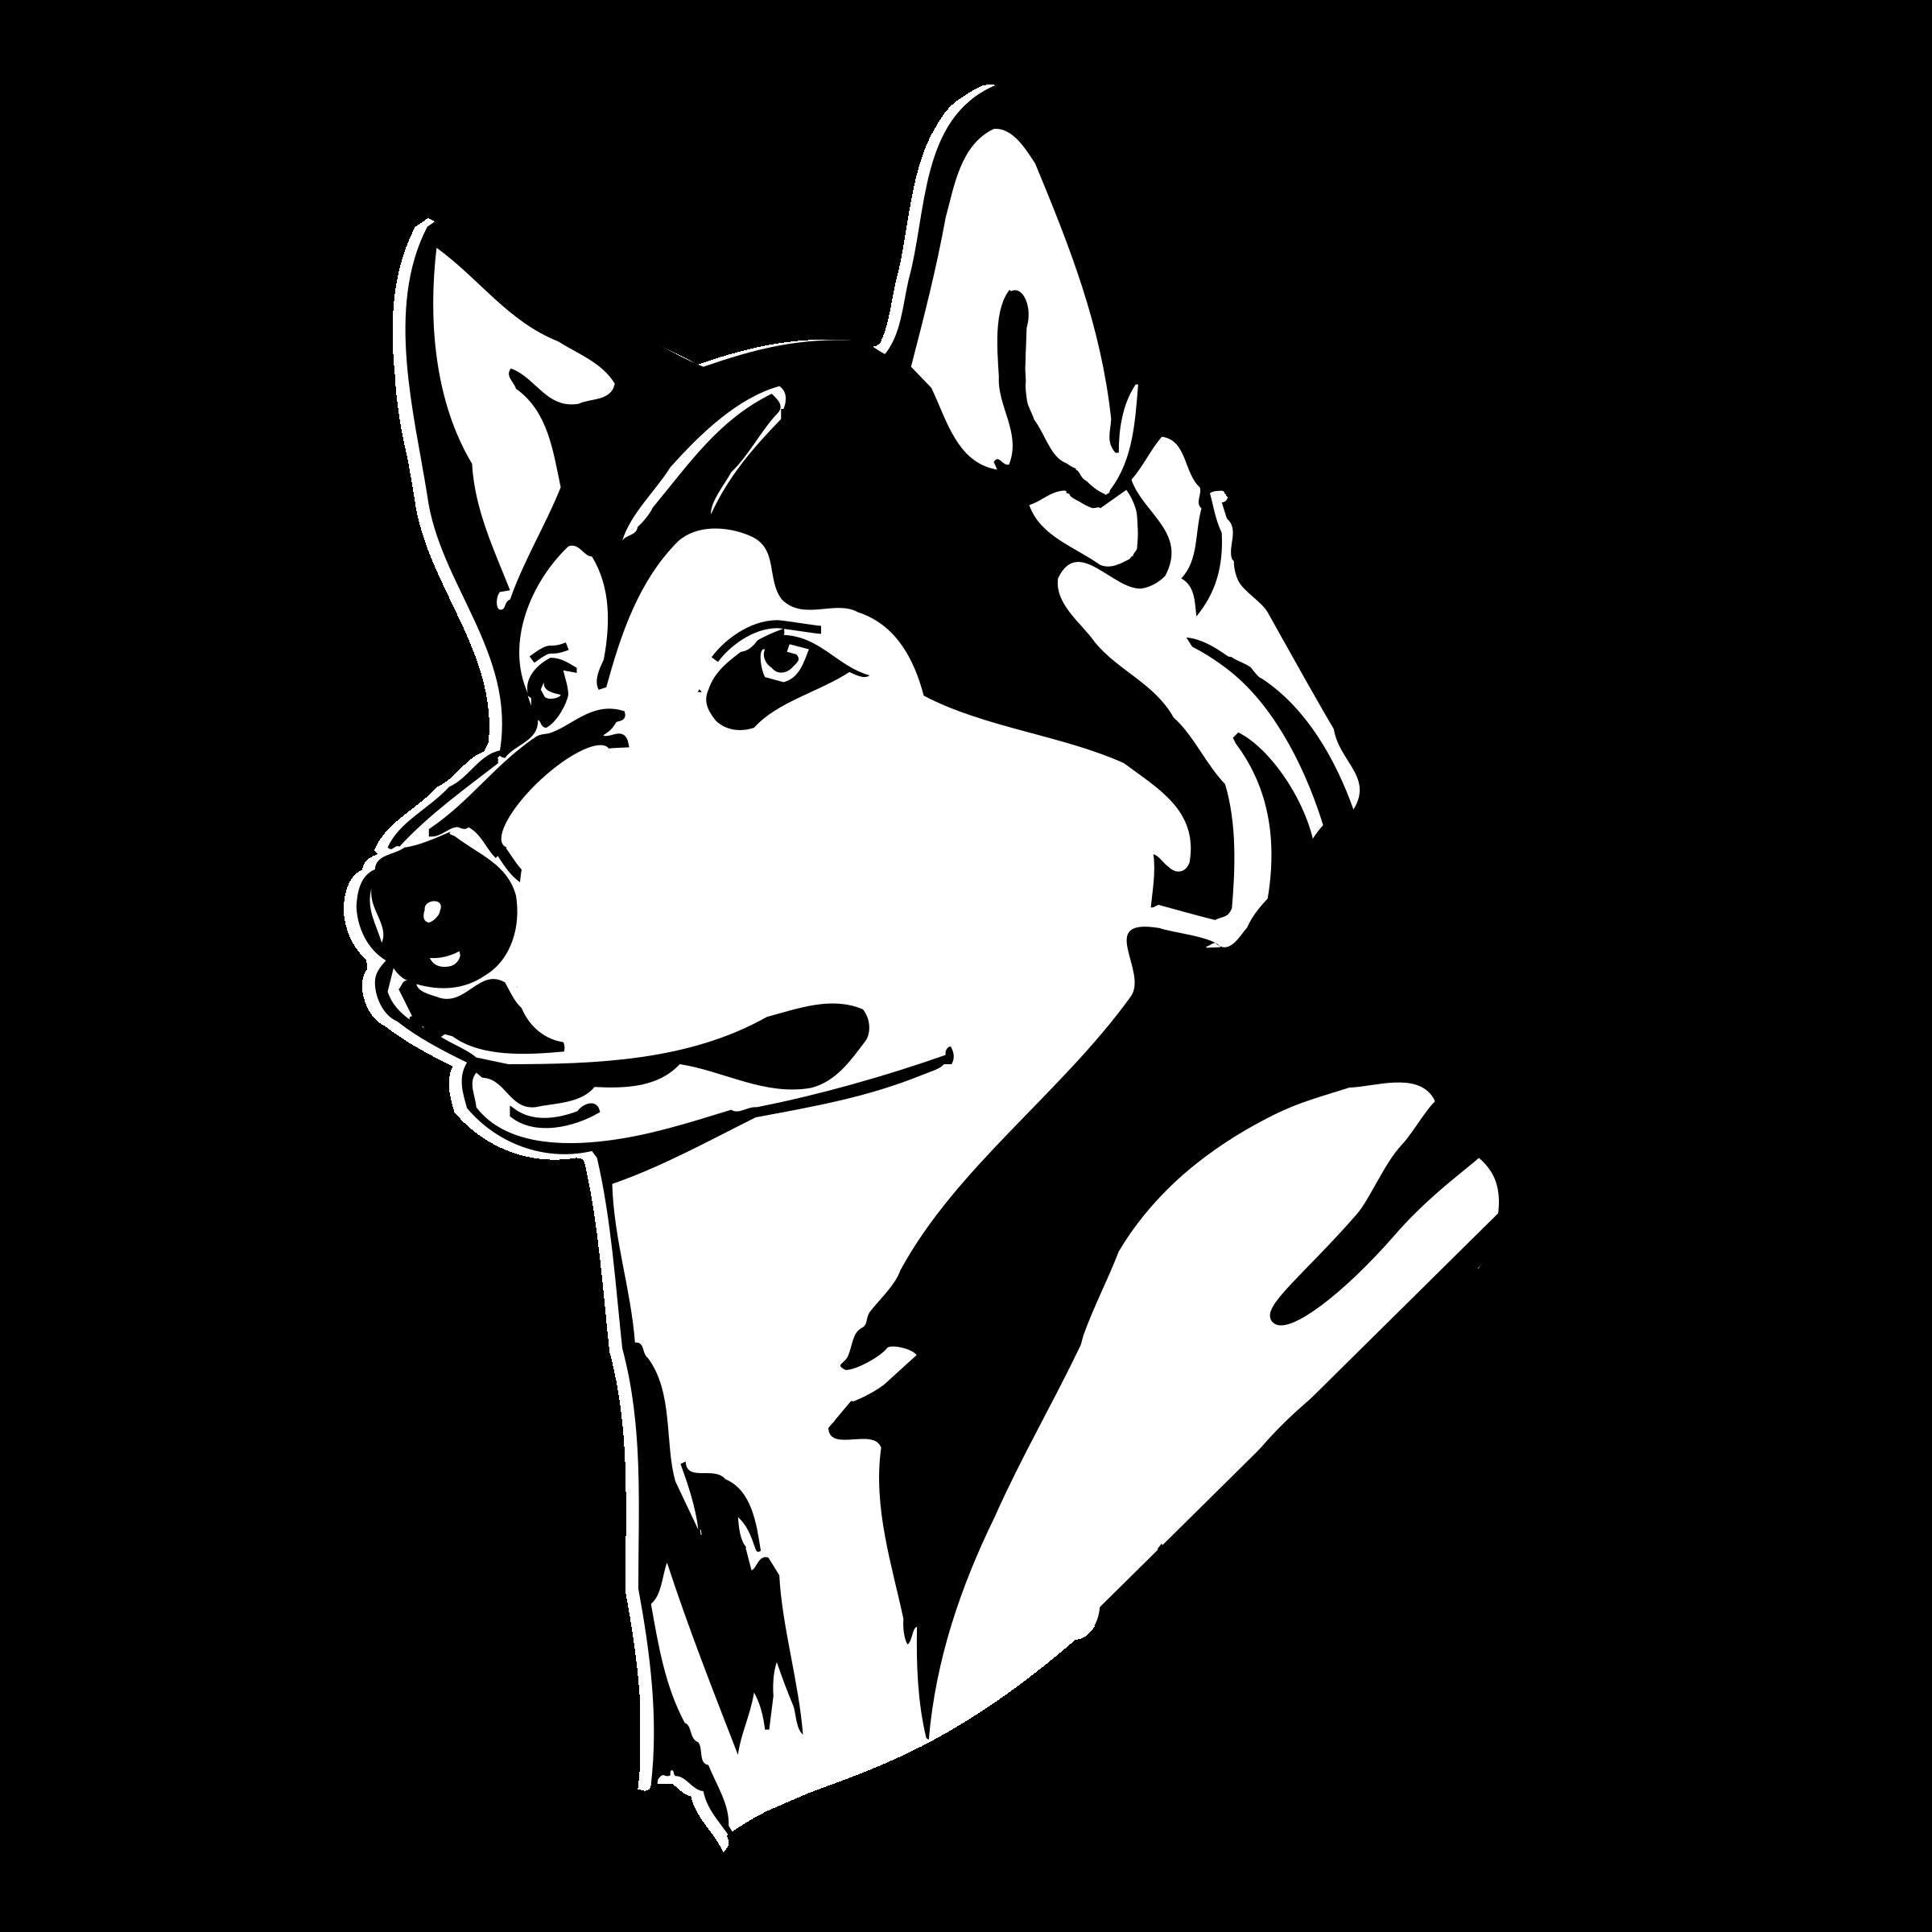 Washington huskies logo png. Husky clipart svg